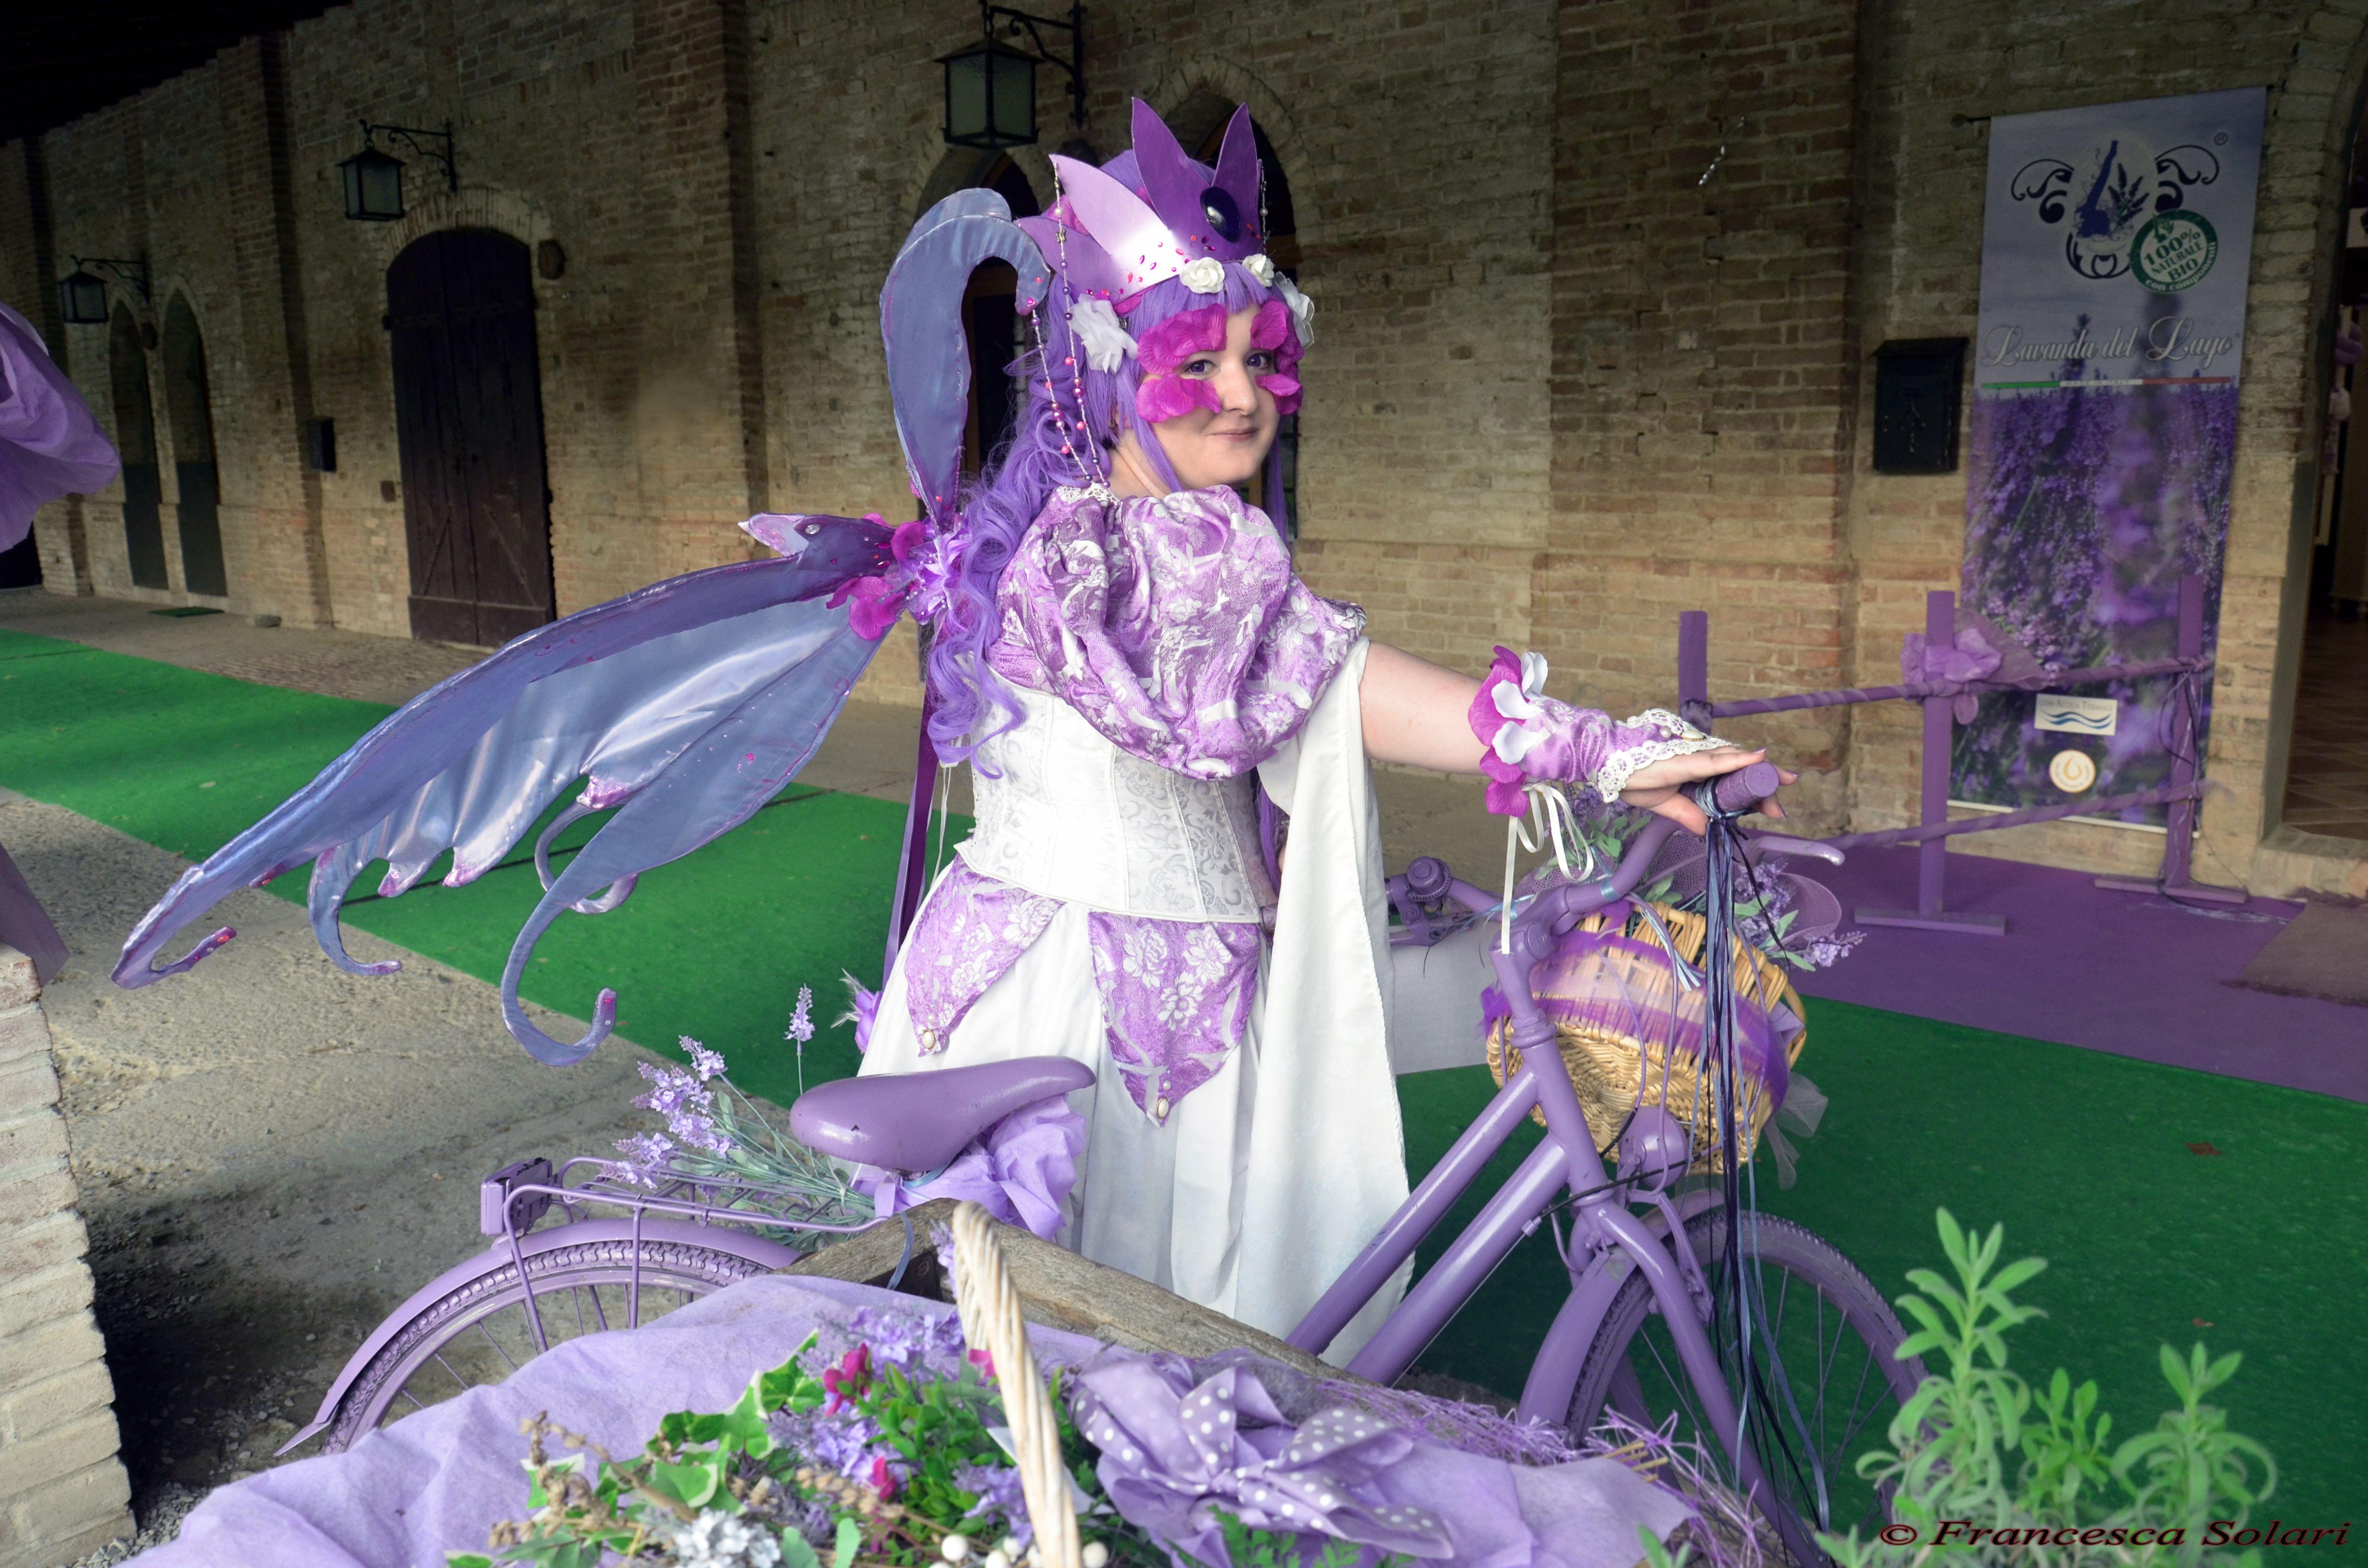 Neanna from Leodhrae http://www.aurorafilippi.com/  Photo by: Francesca Solari https://www.facebook.com/Francesca-Solari-Photography-454269394624161/ Location: Grazzano Visconti (Italy) #leodhrae #fantasy #costume #cosplay #book #novel #fairyland